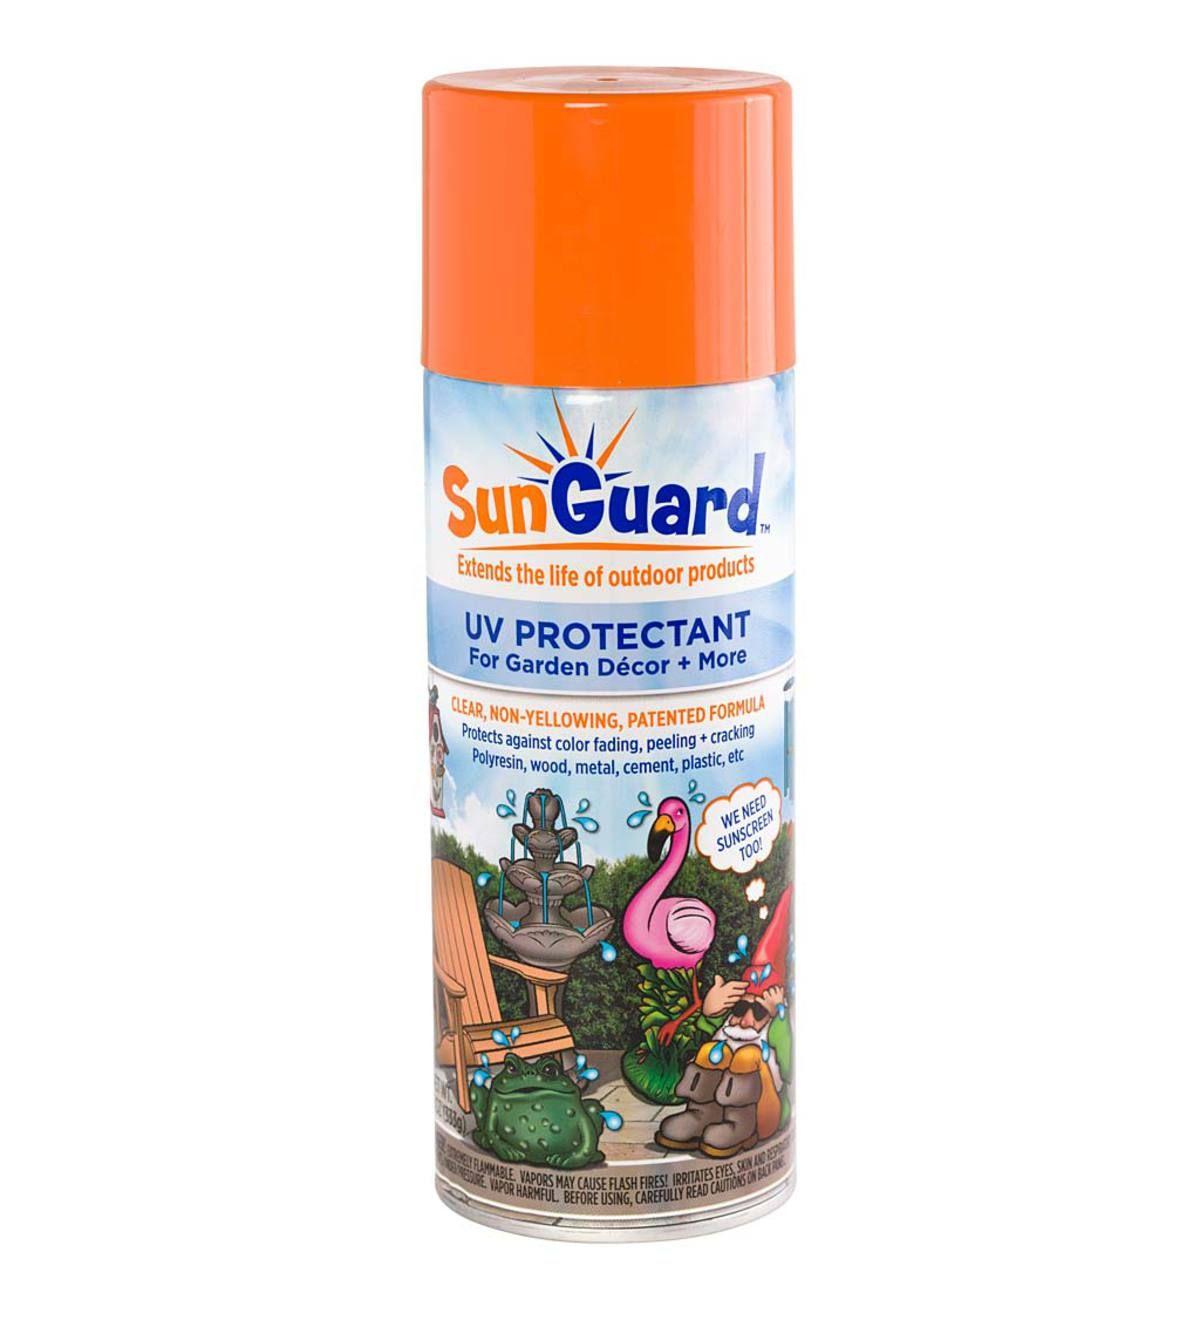 Uv Protectant Spray For Outdoor Decor